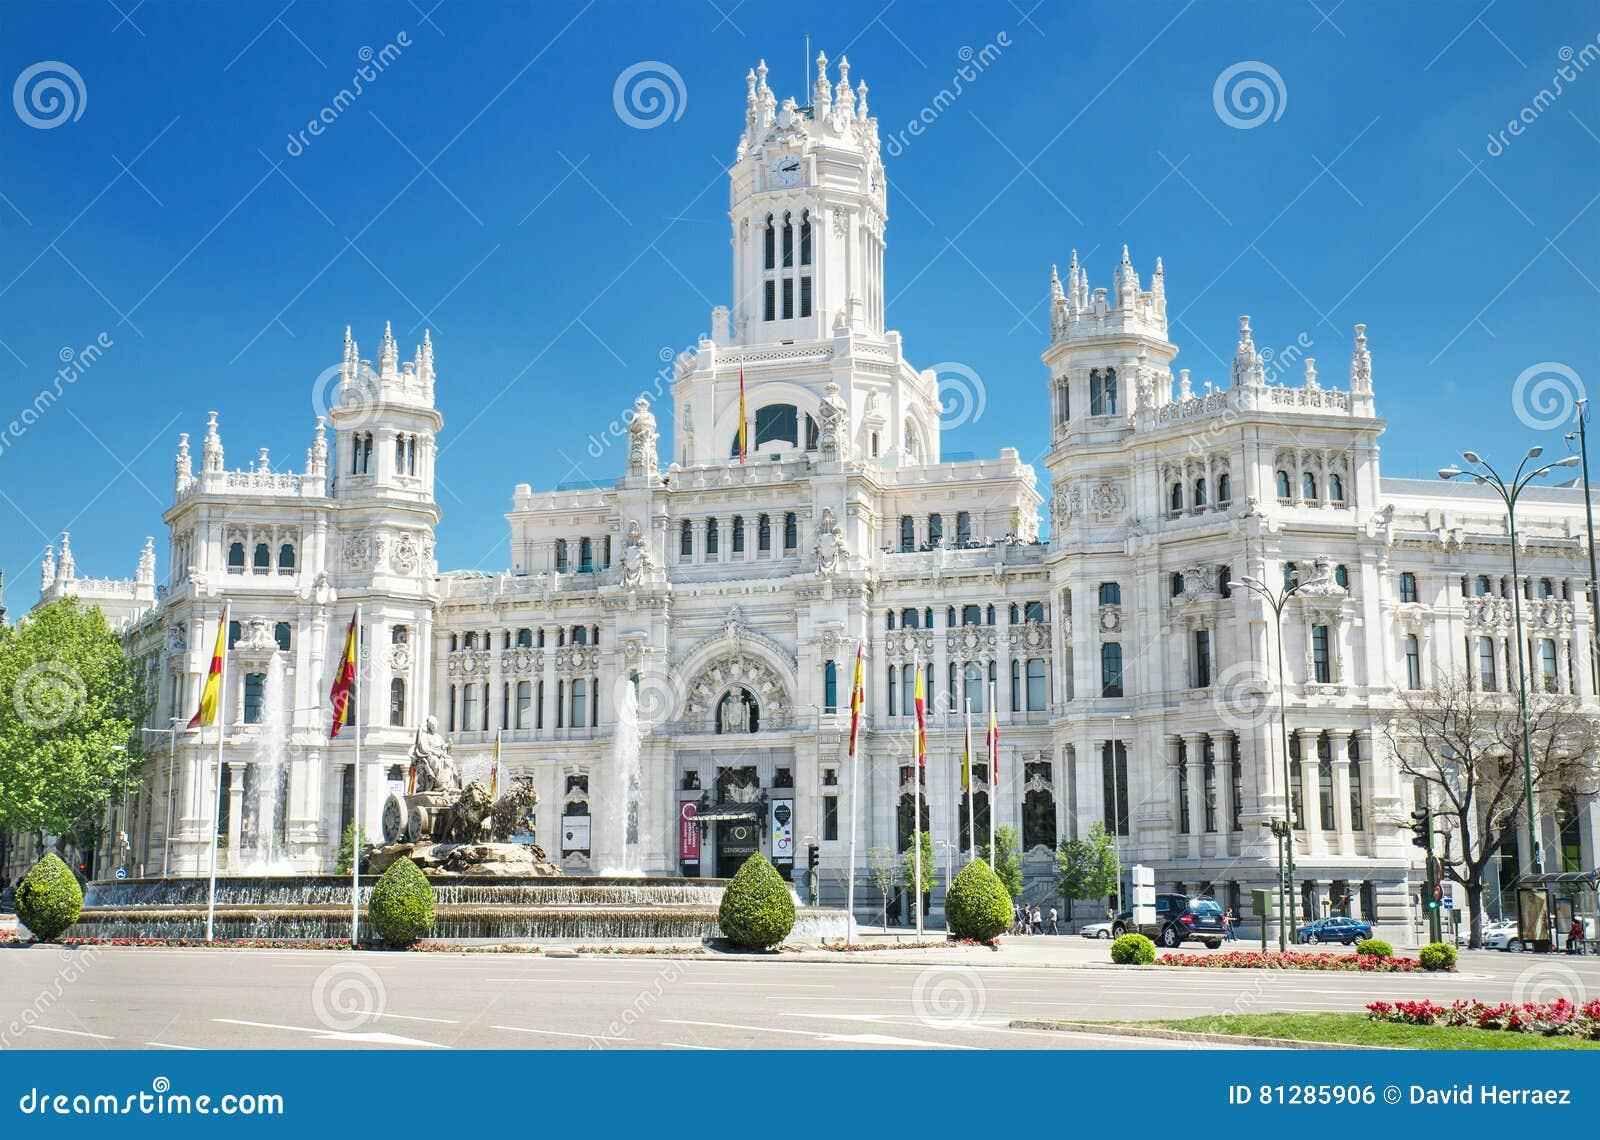 Plaza De Cibeles And Palacio De Comunicaciones Famous